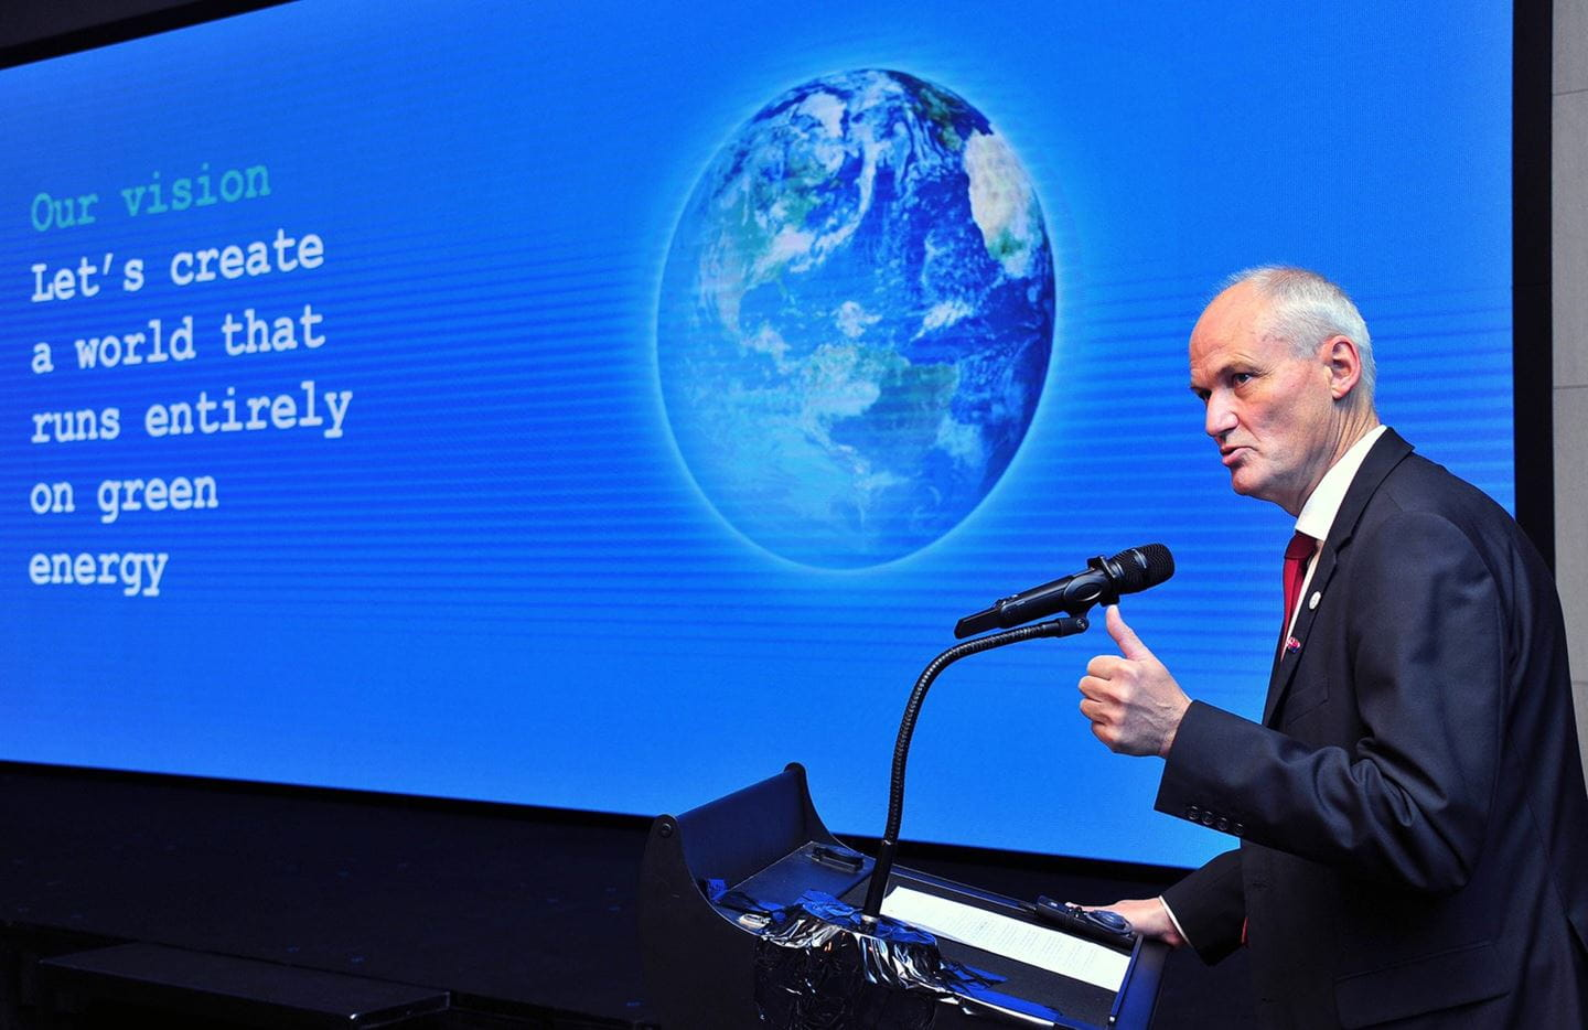 Einar Jensen, Danish Ambassador to S. Korea, making remarks about bilateral cooperation between Korea and Denmark